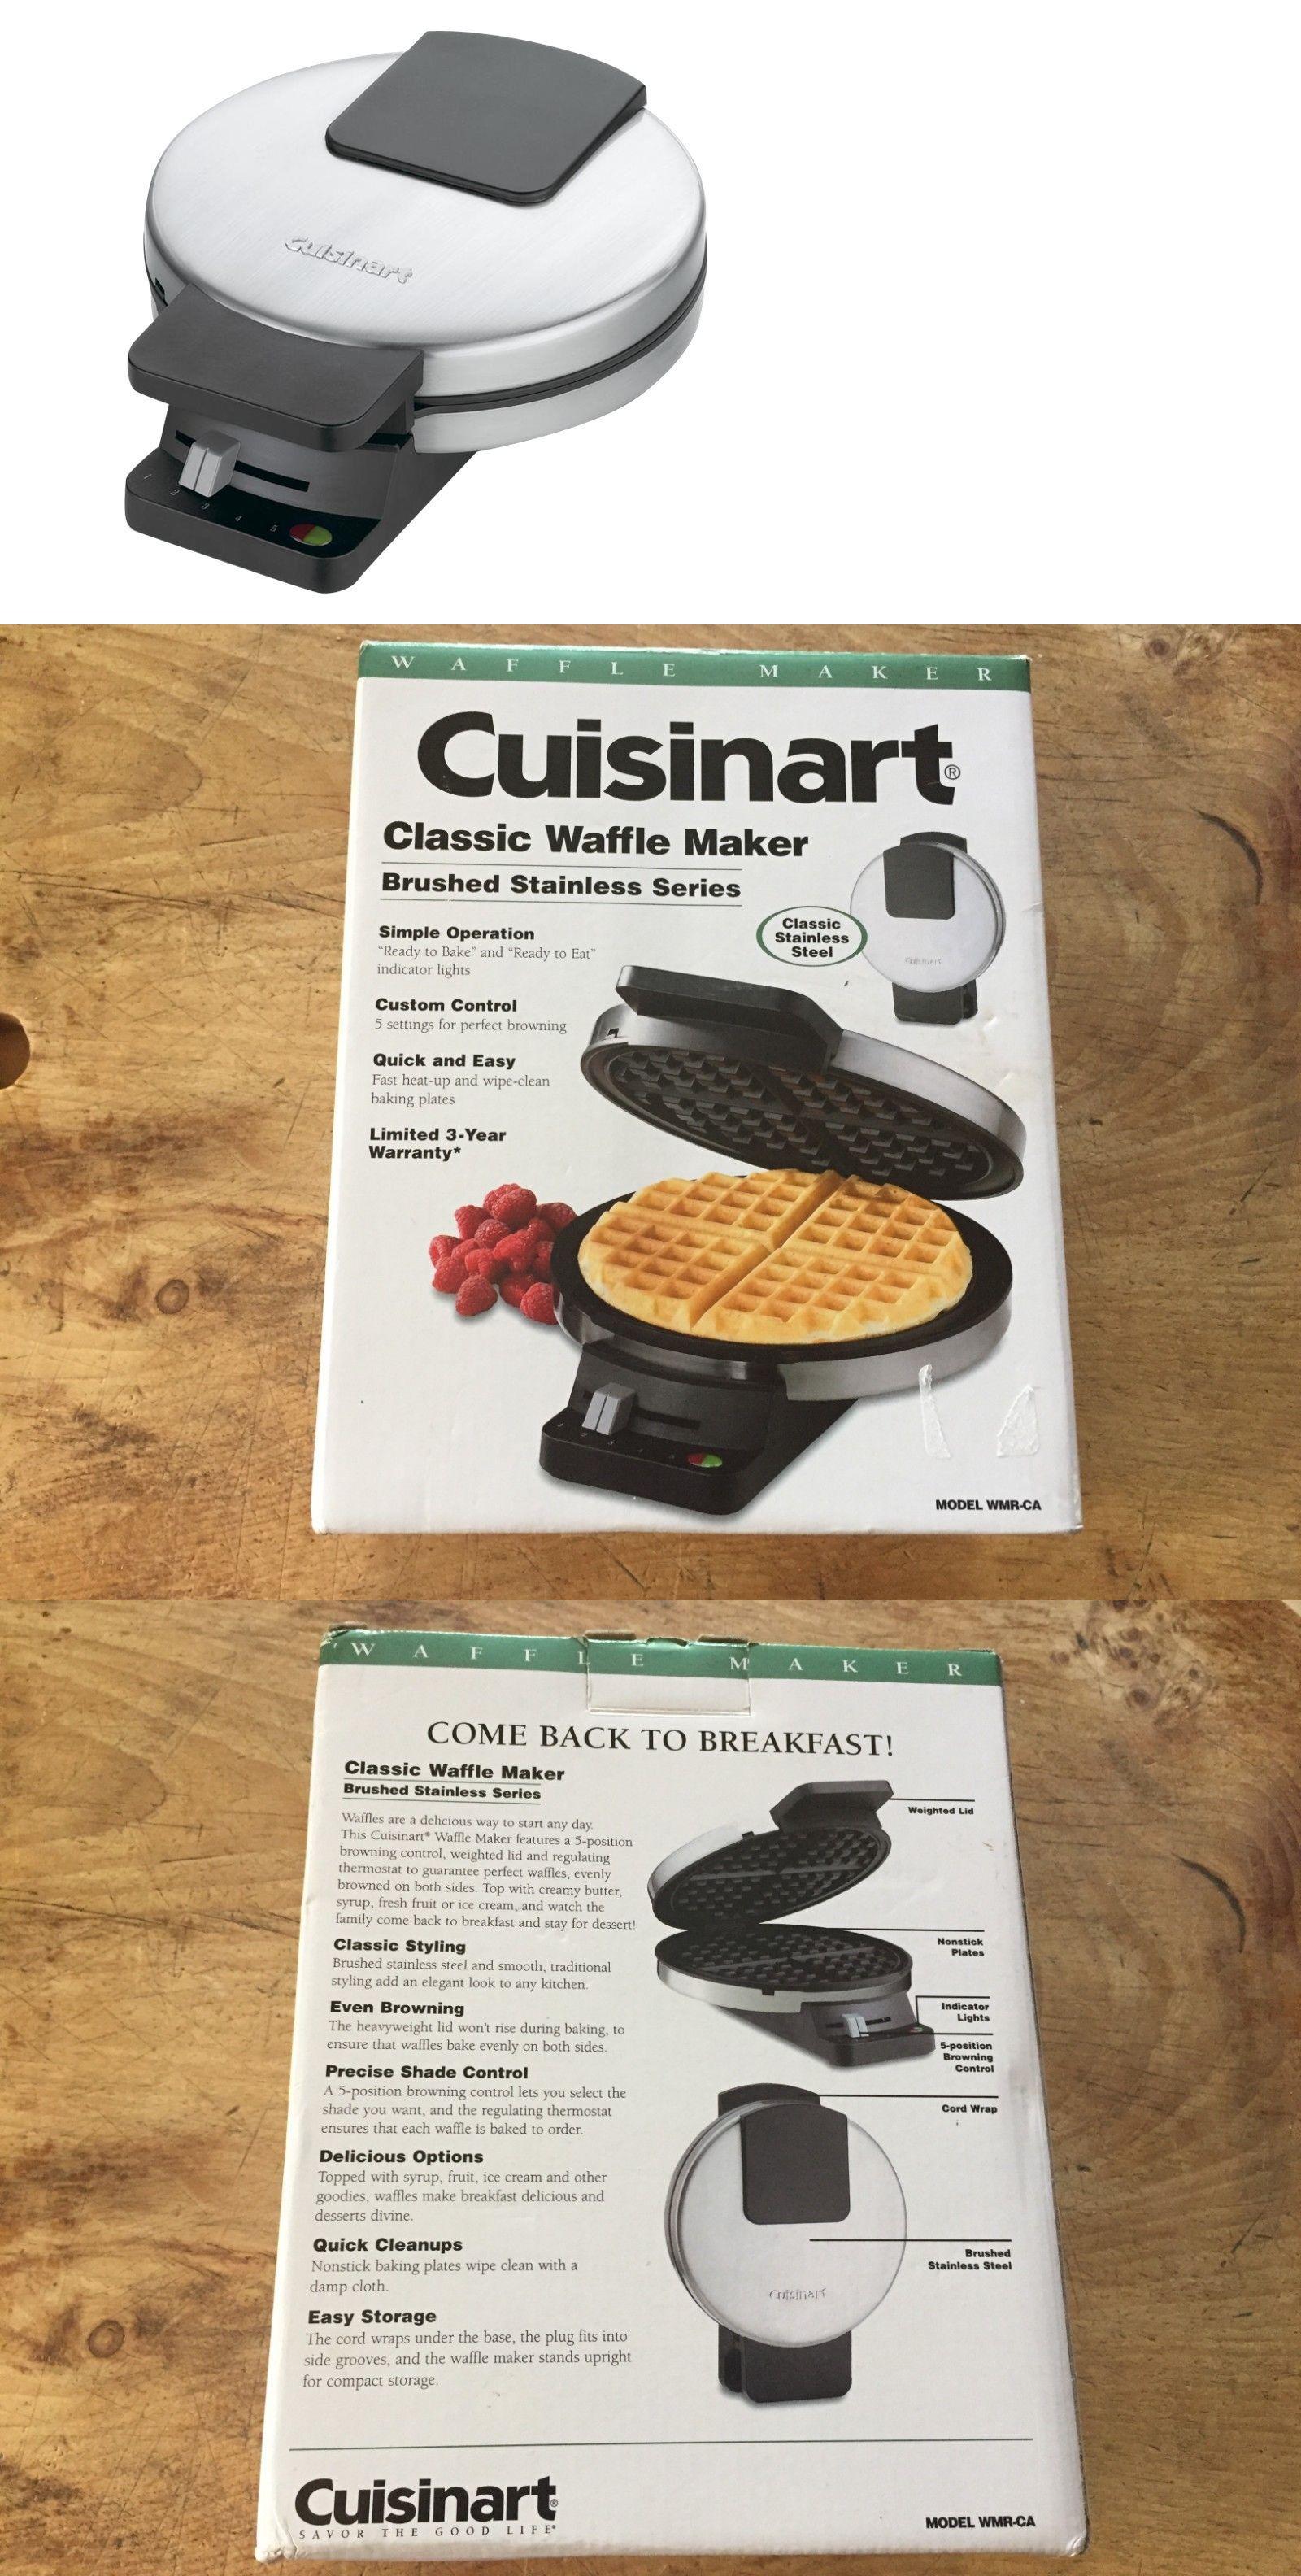 Waffle Makers 168763 Cuisinart Classic Waffle Maker Model Wmr Ca